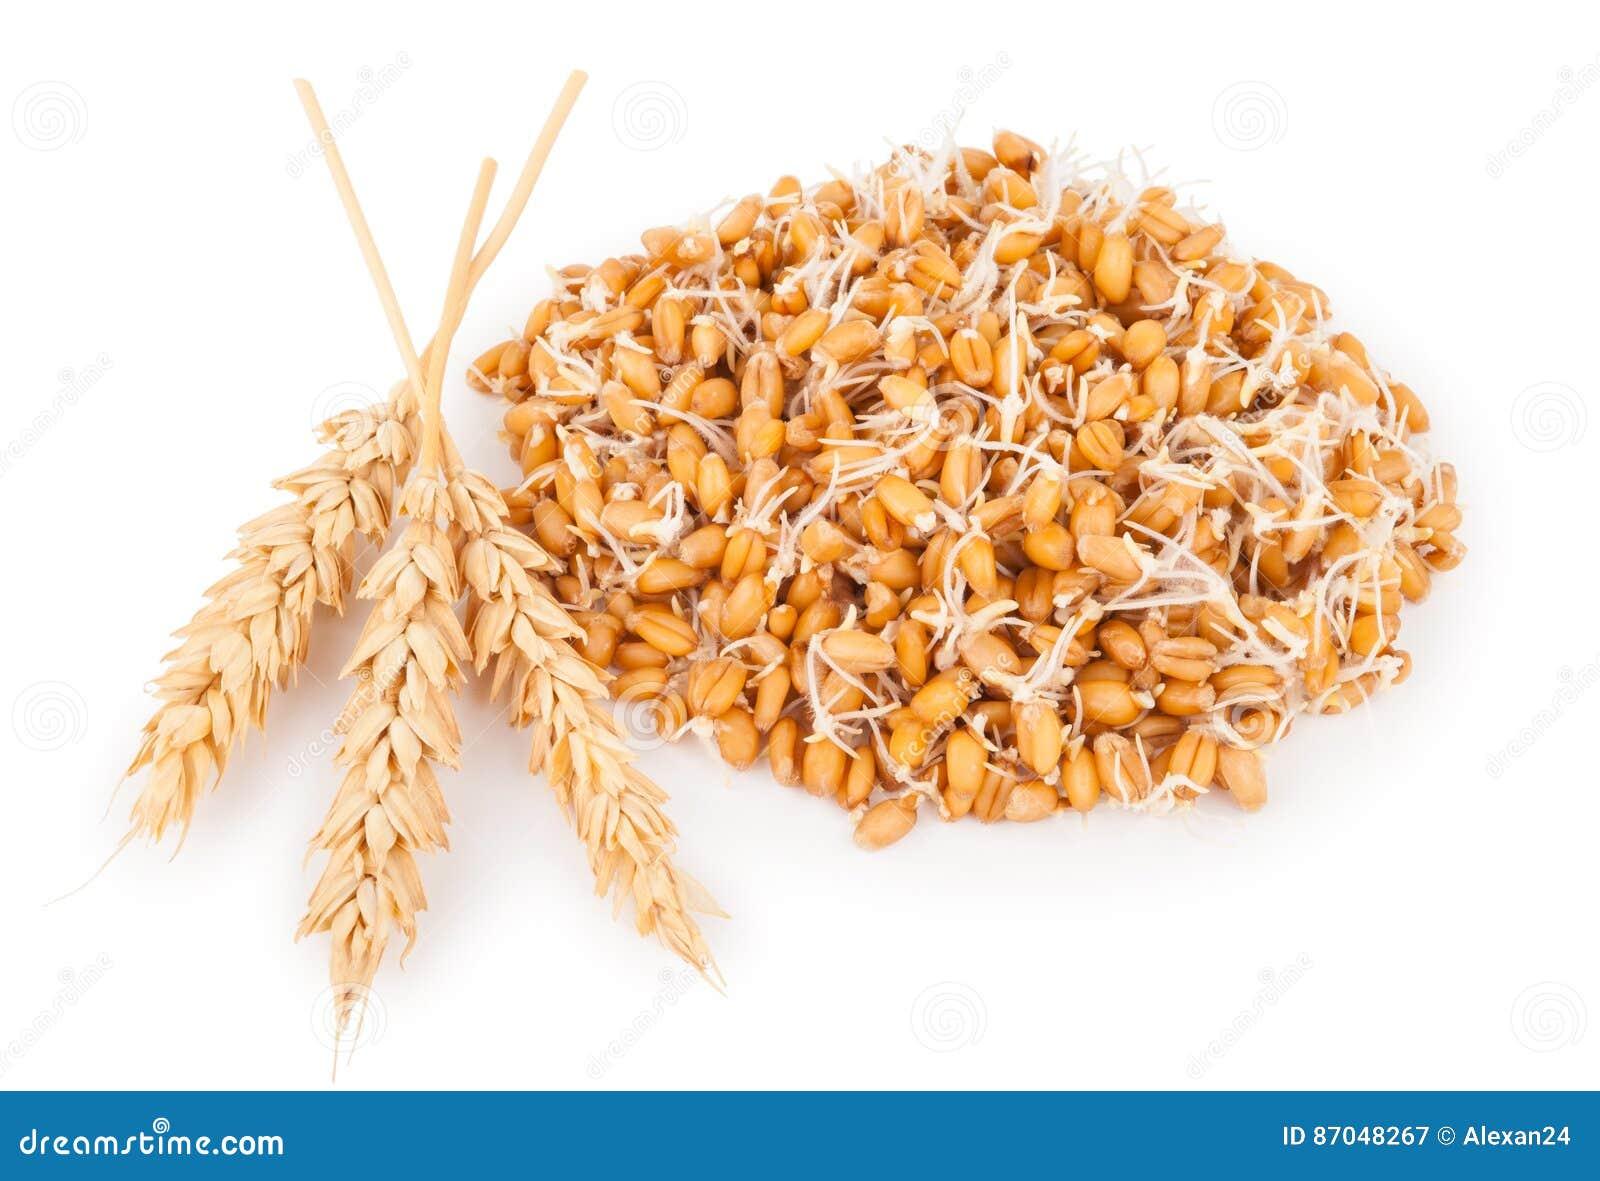 Wheat germ with ears